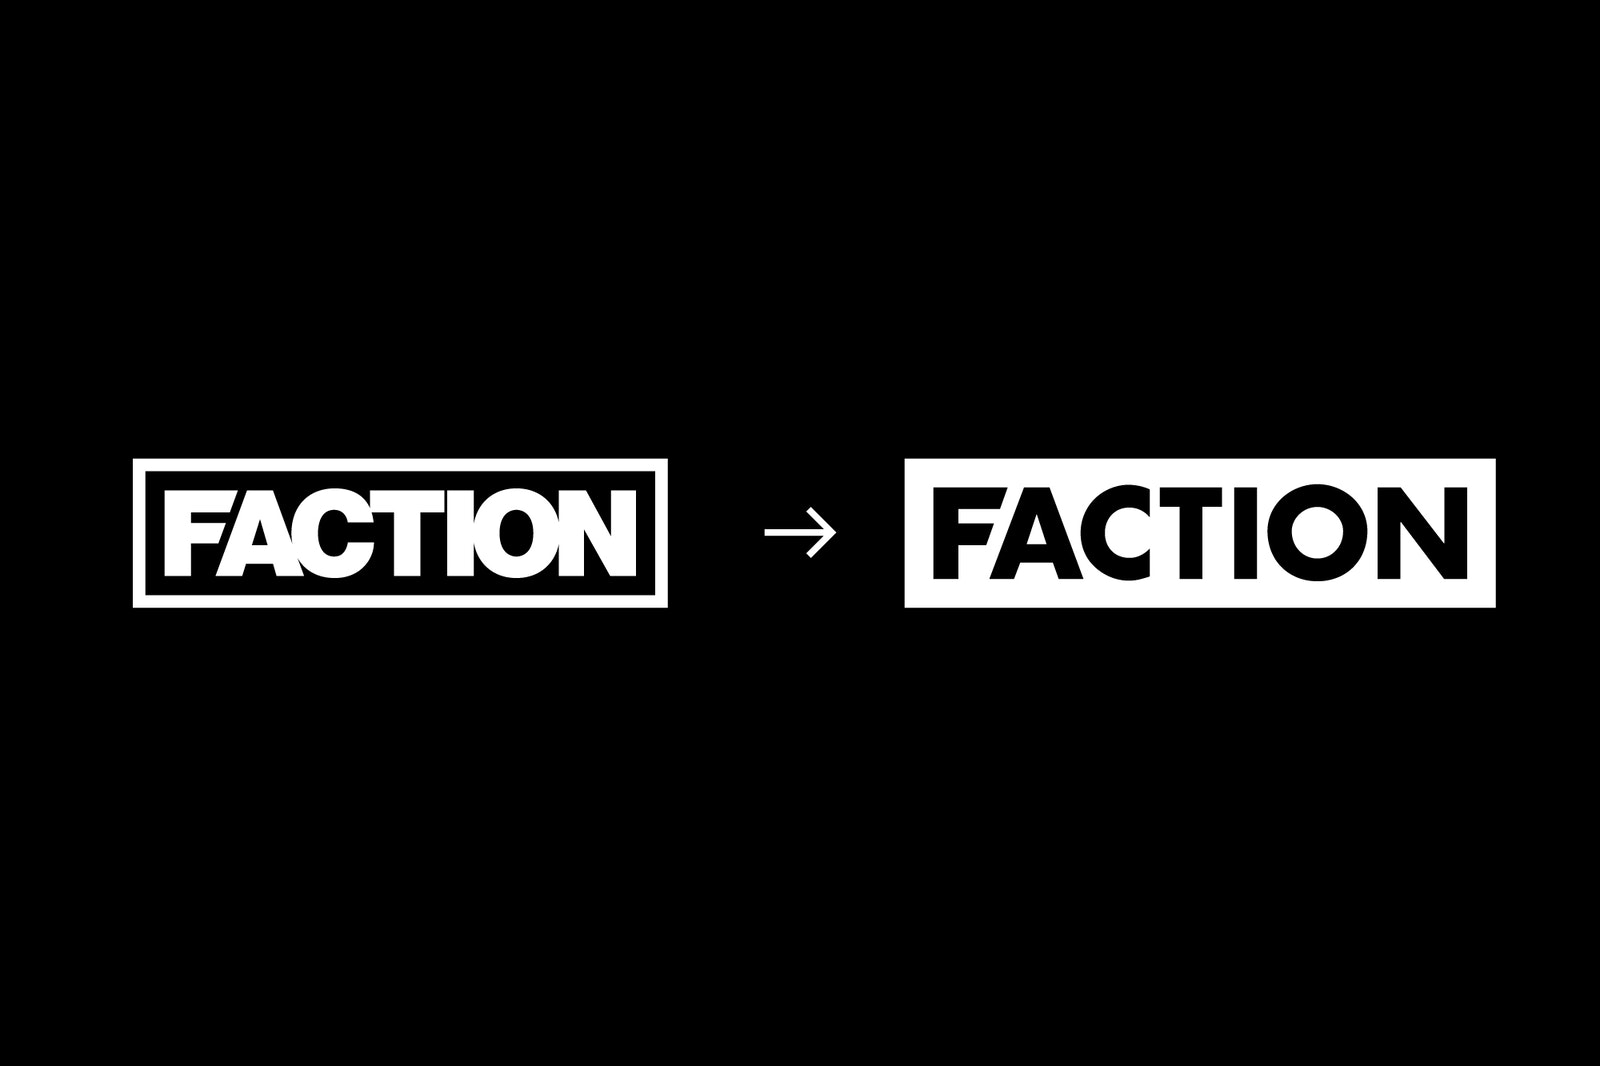 MASTER CS FACTION Logo Evolution